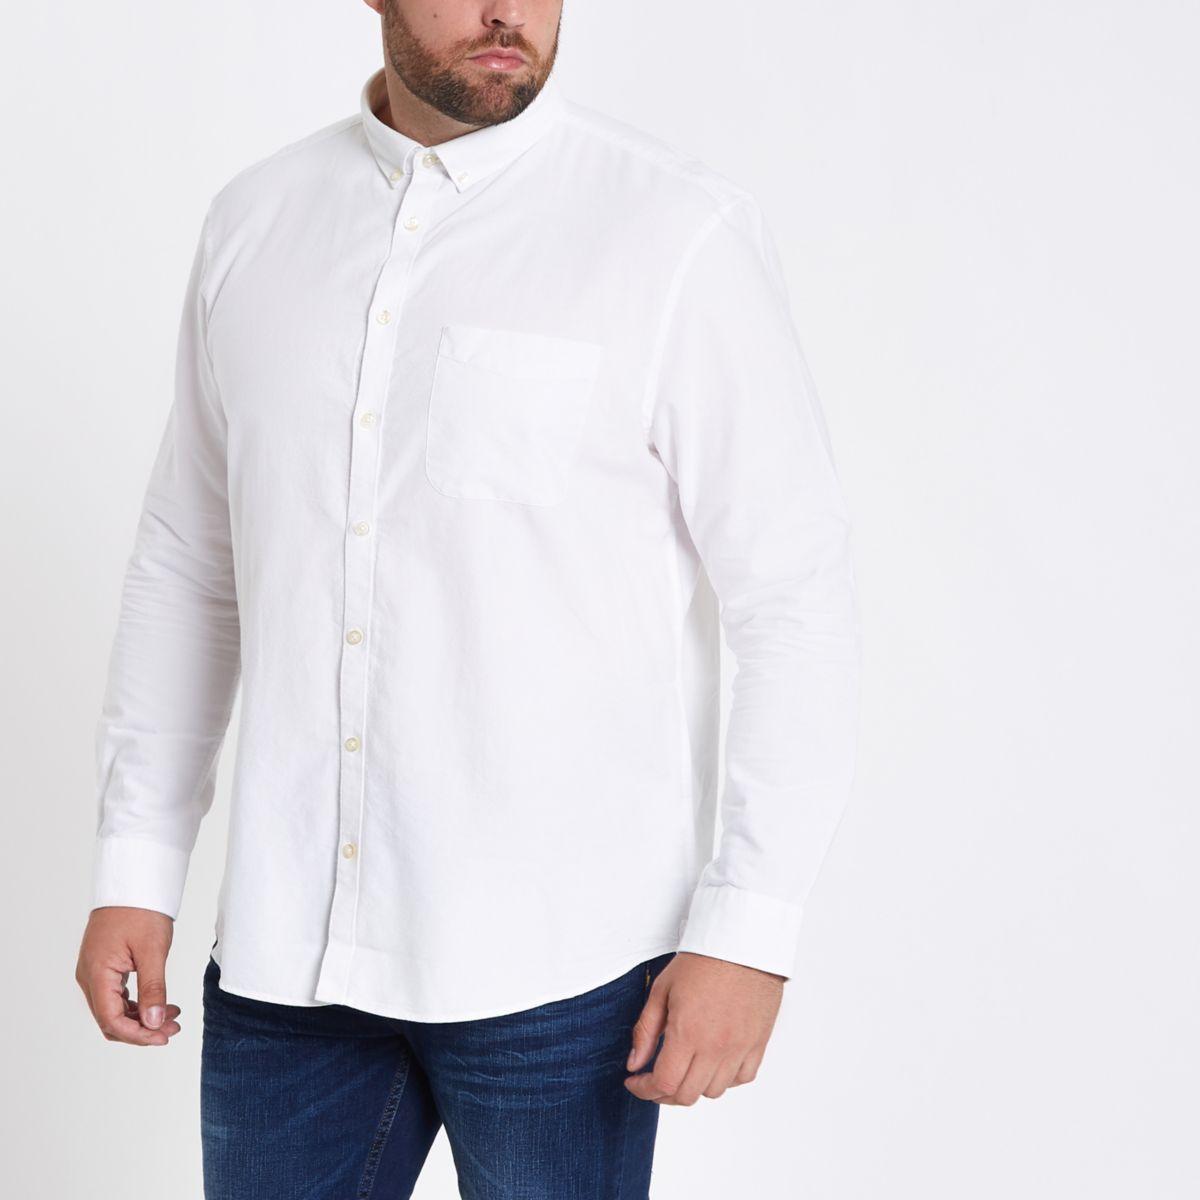 Weißes, langärmliges Oxford Hemd